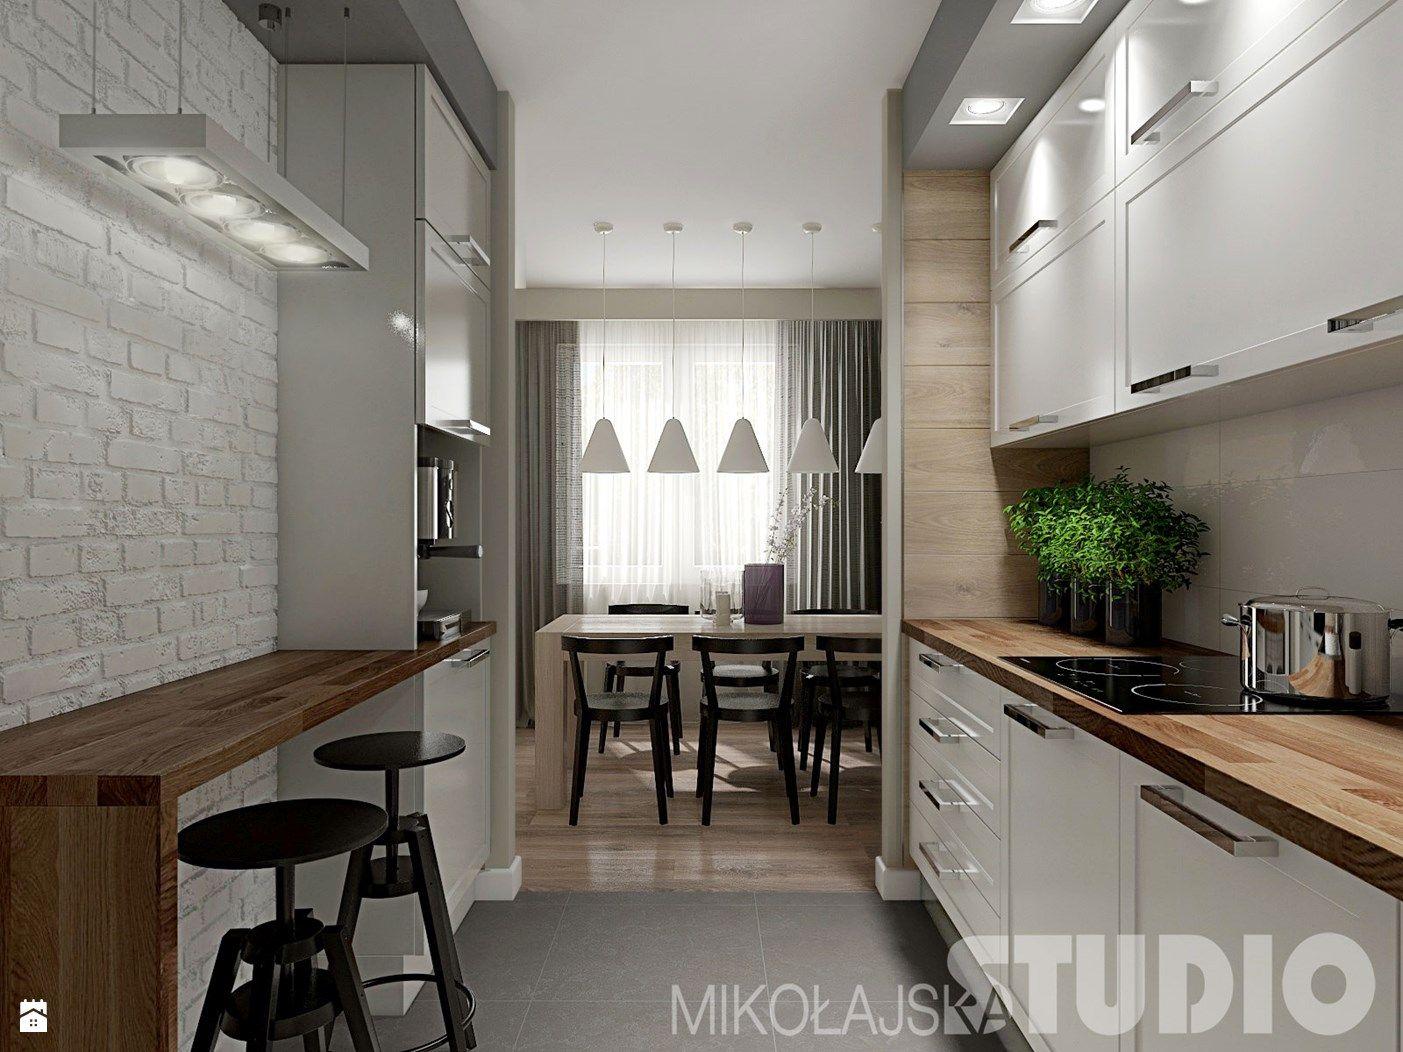 Zdjecie Kuchnia W Stylu Skandynawskim Interior De Cocina Cocinas De Casa Diseno De Cocina